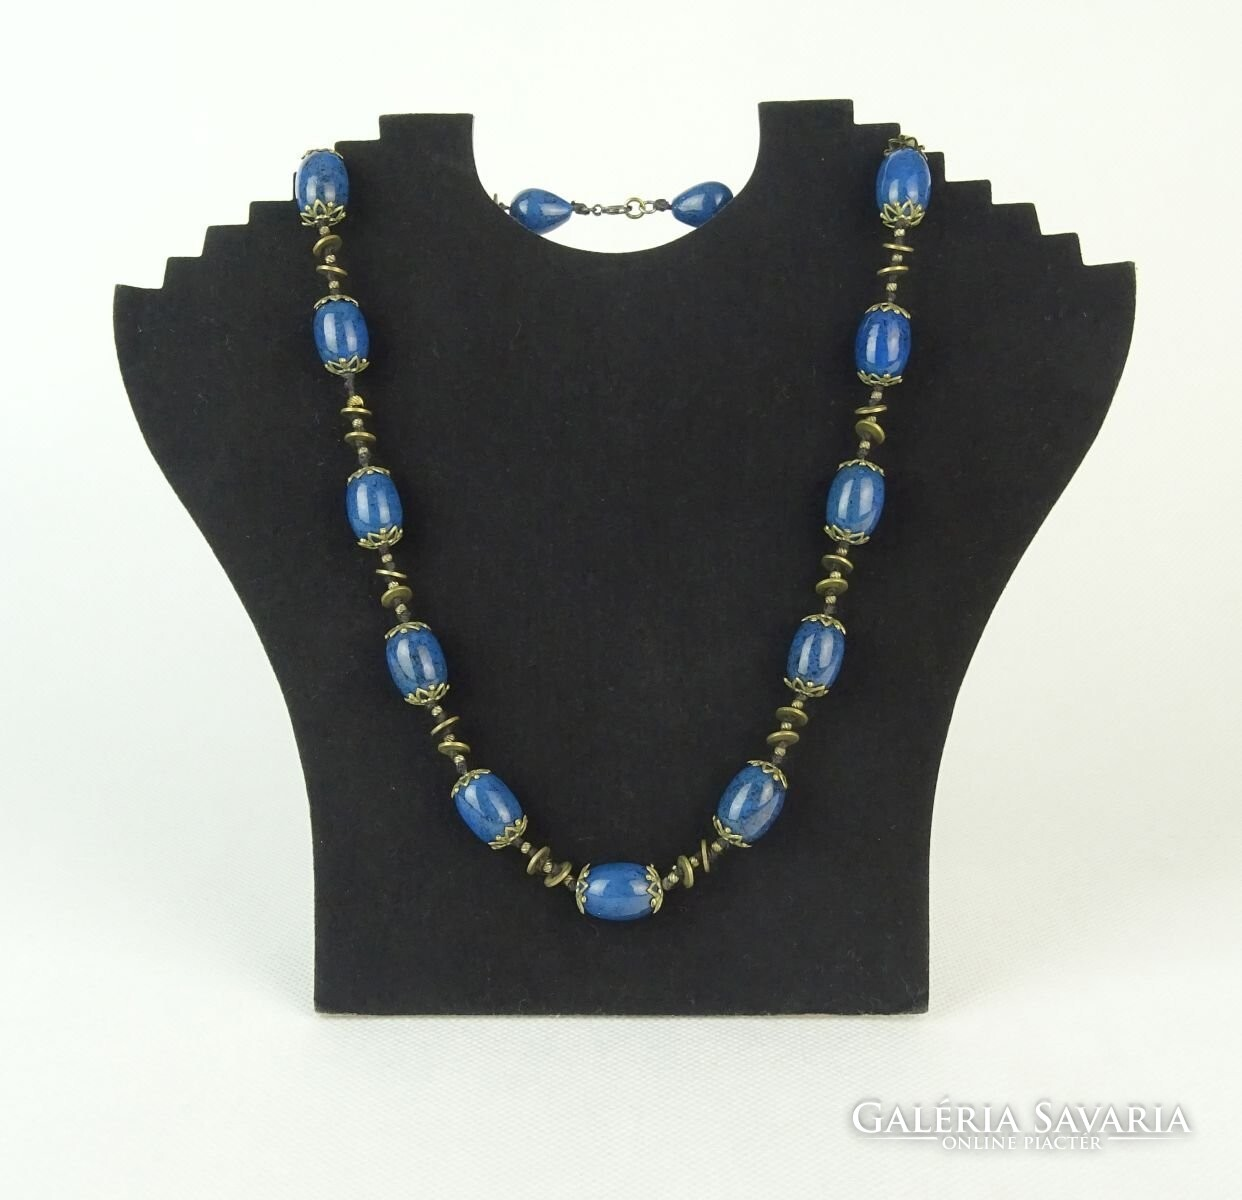 650c115633 0Q809 Igényes 15 köves női bizsu nyaklánc nyakék - Jewelry   Galeria ...